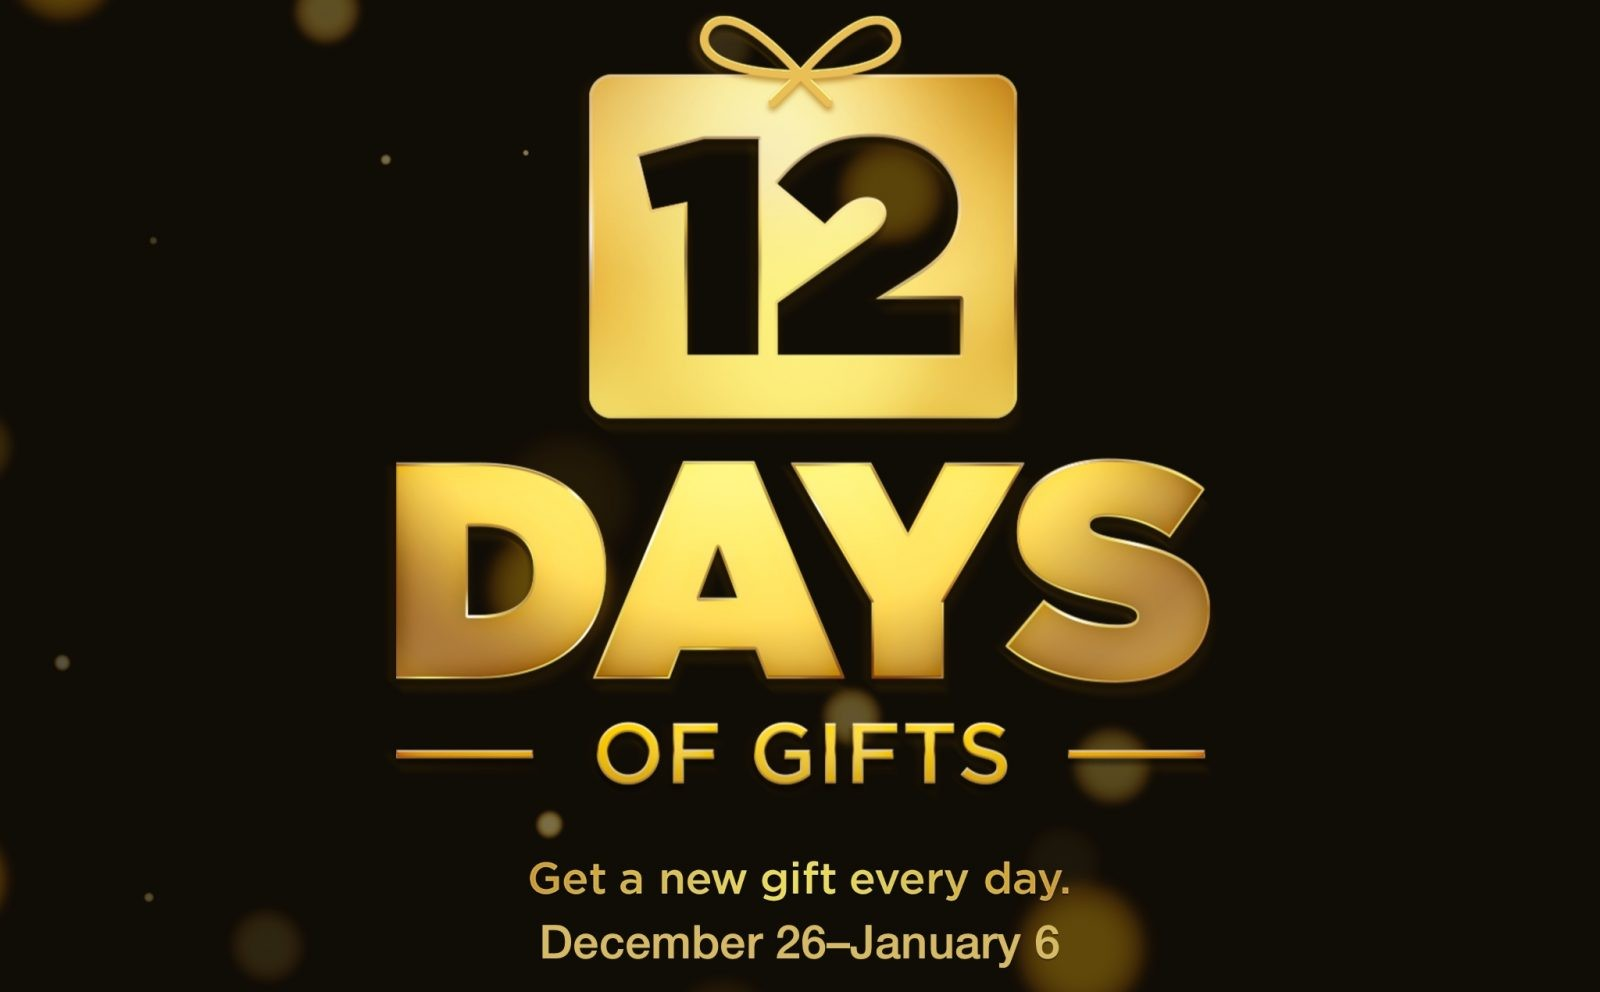 Dziśstartuje 12 Days of Gift